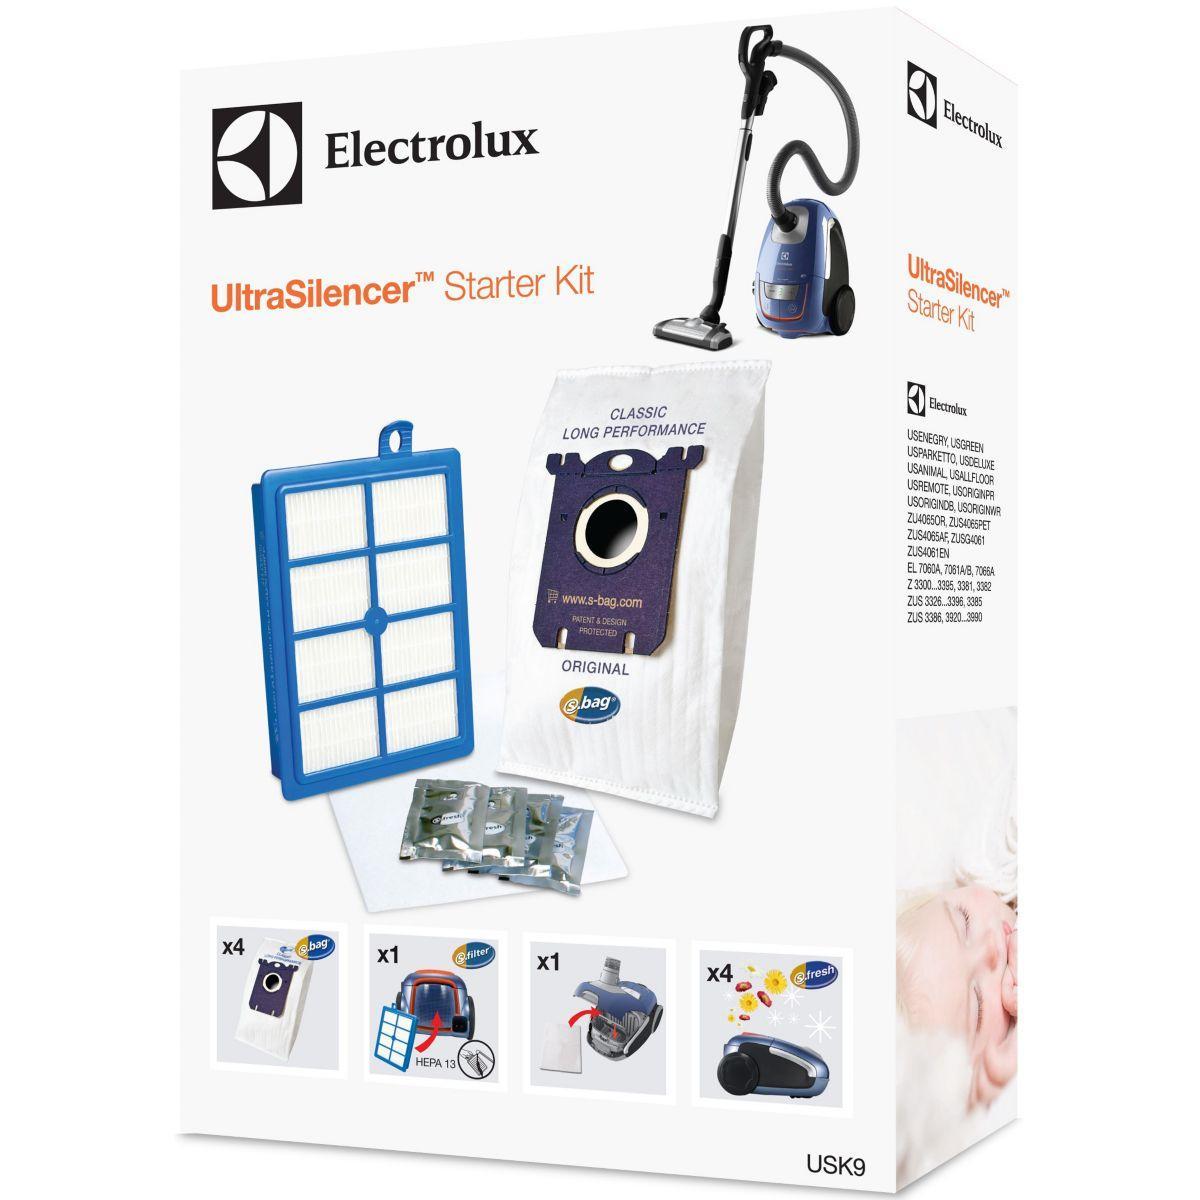 Sac aspirateur electrolux usk10 kit ultracaptic - 10% de remise : code access10